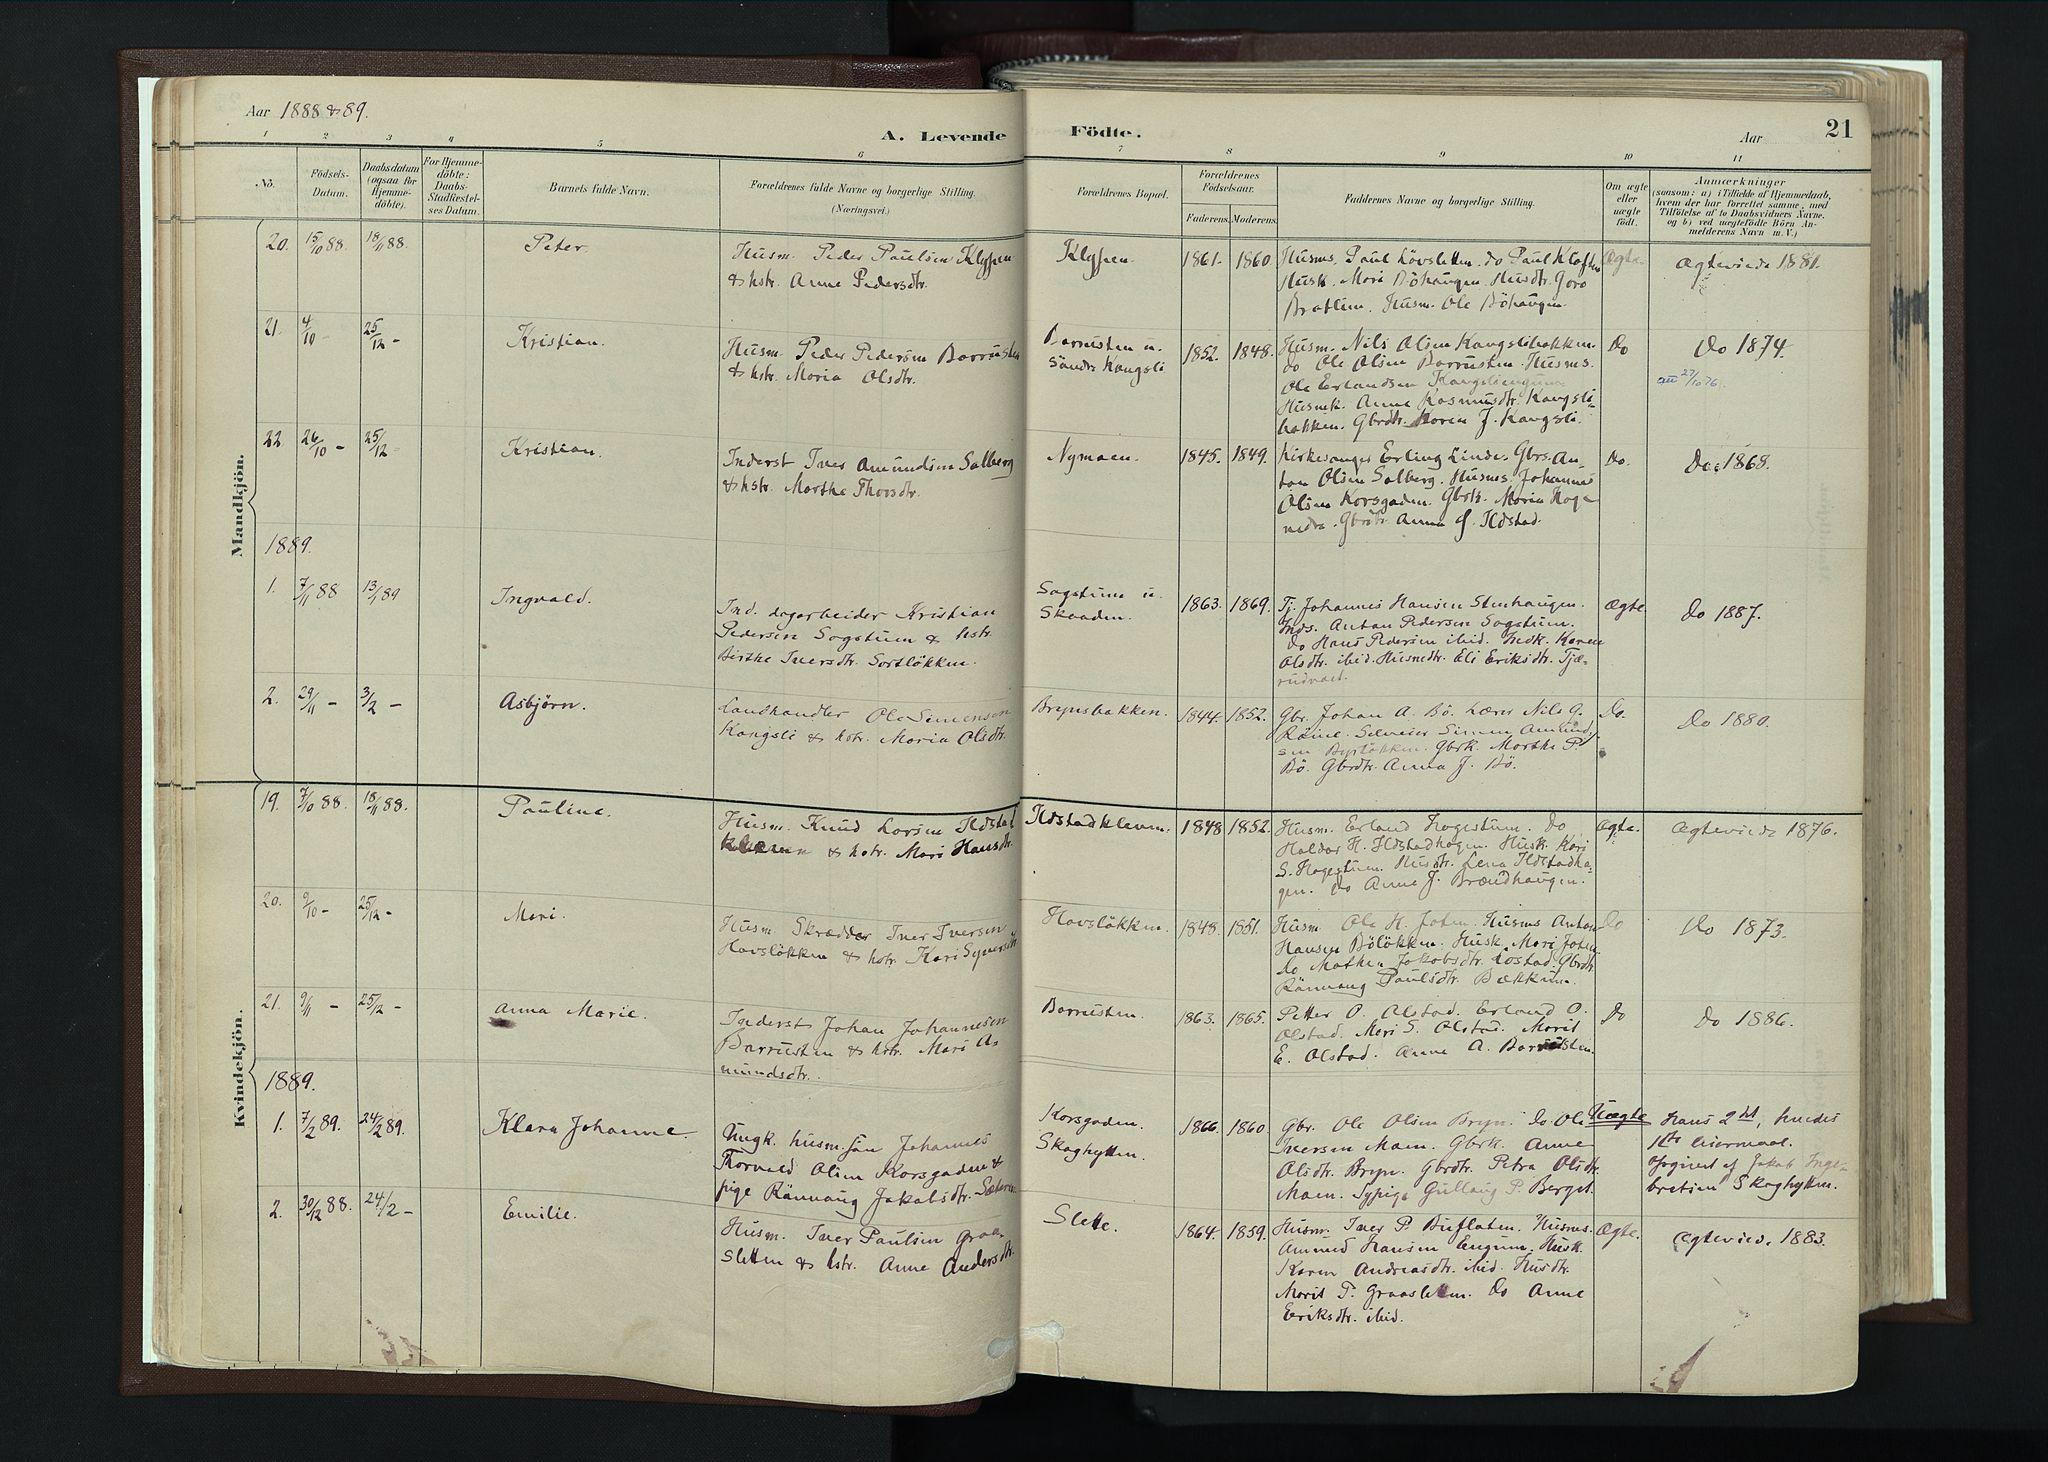 SAH, Nord-Fron prestekontor, Ministerialbok nr. 4, 1884-1914, s. 21